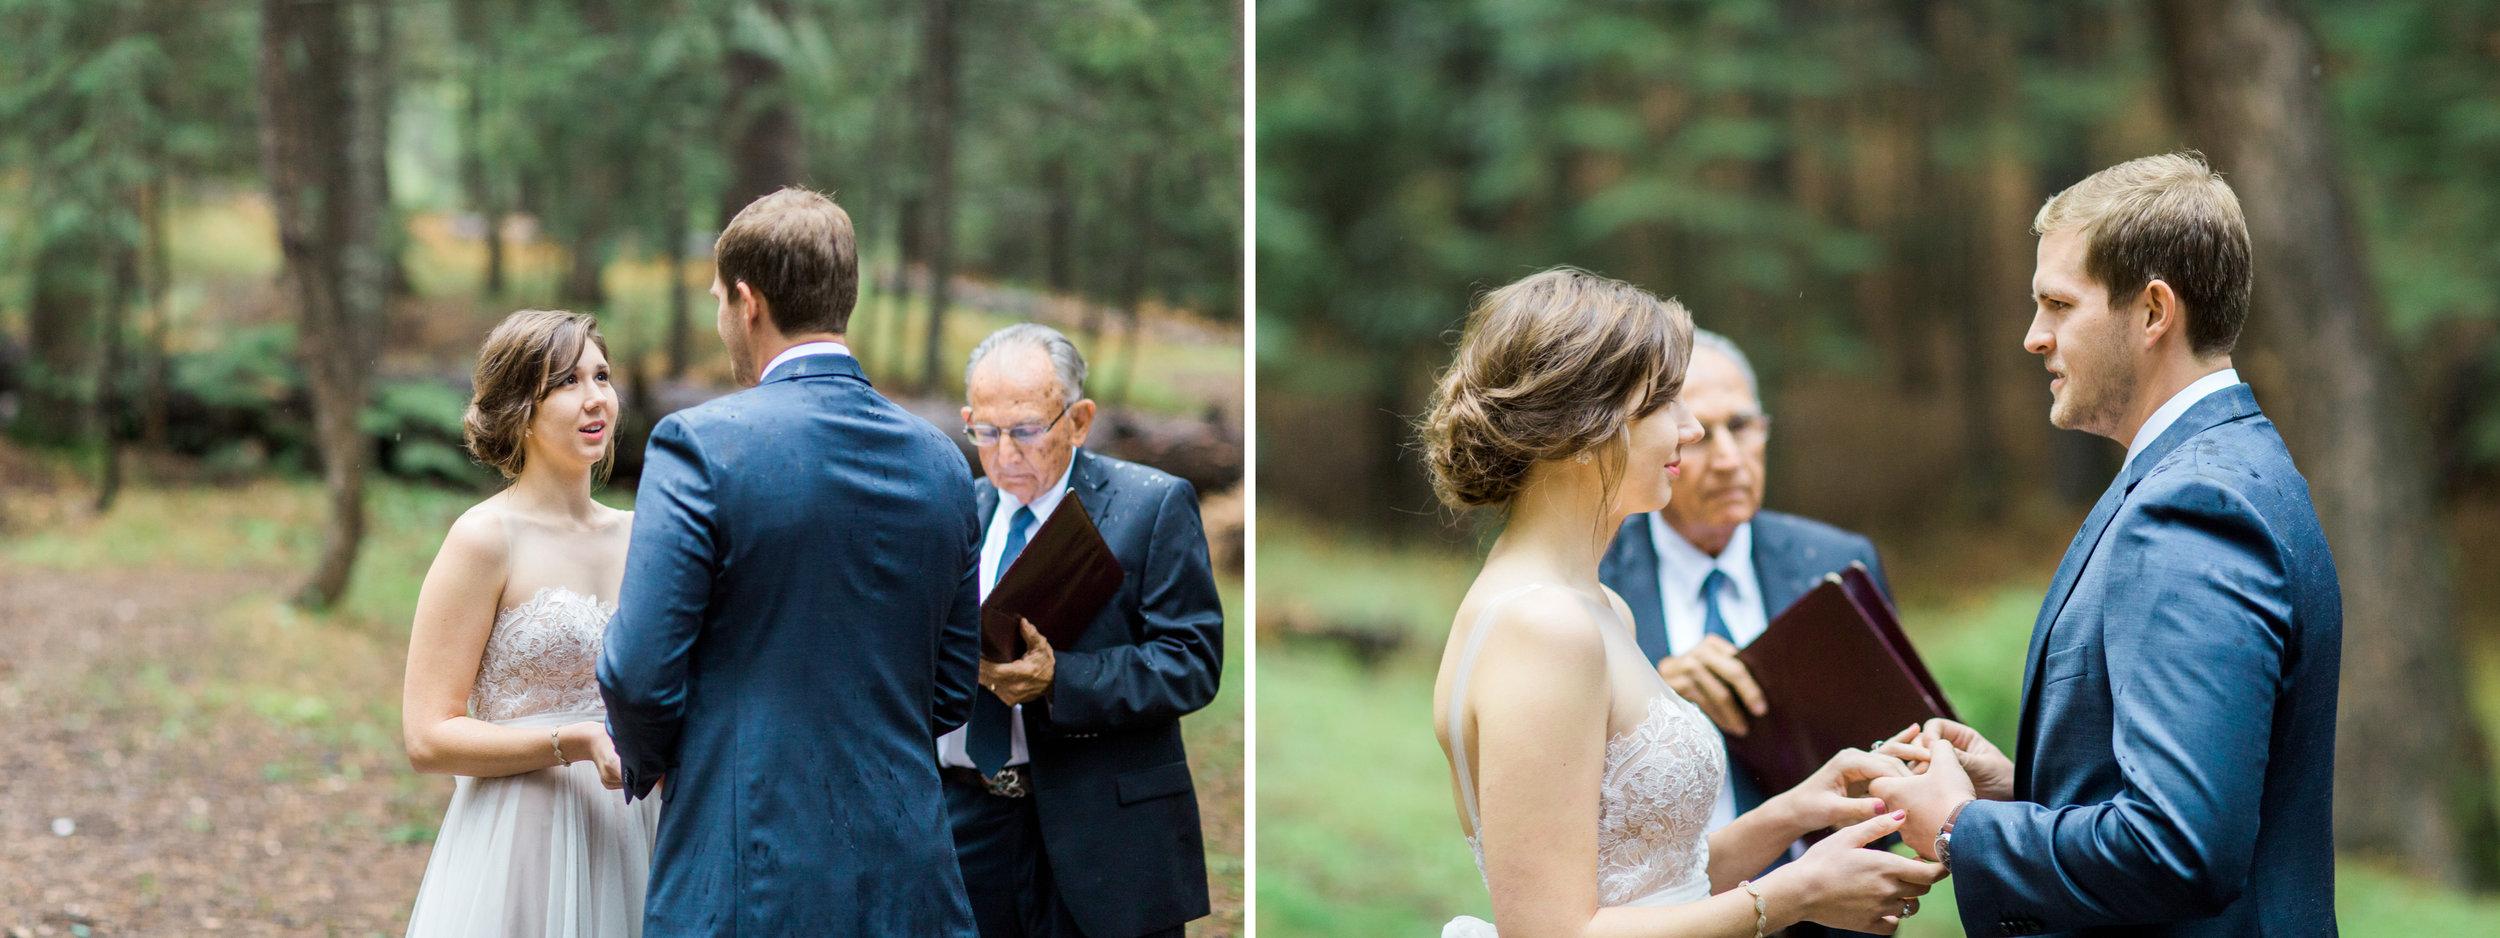 Our Wedding Post_068.JPG